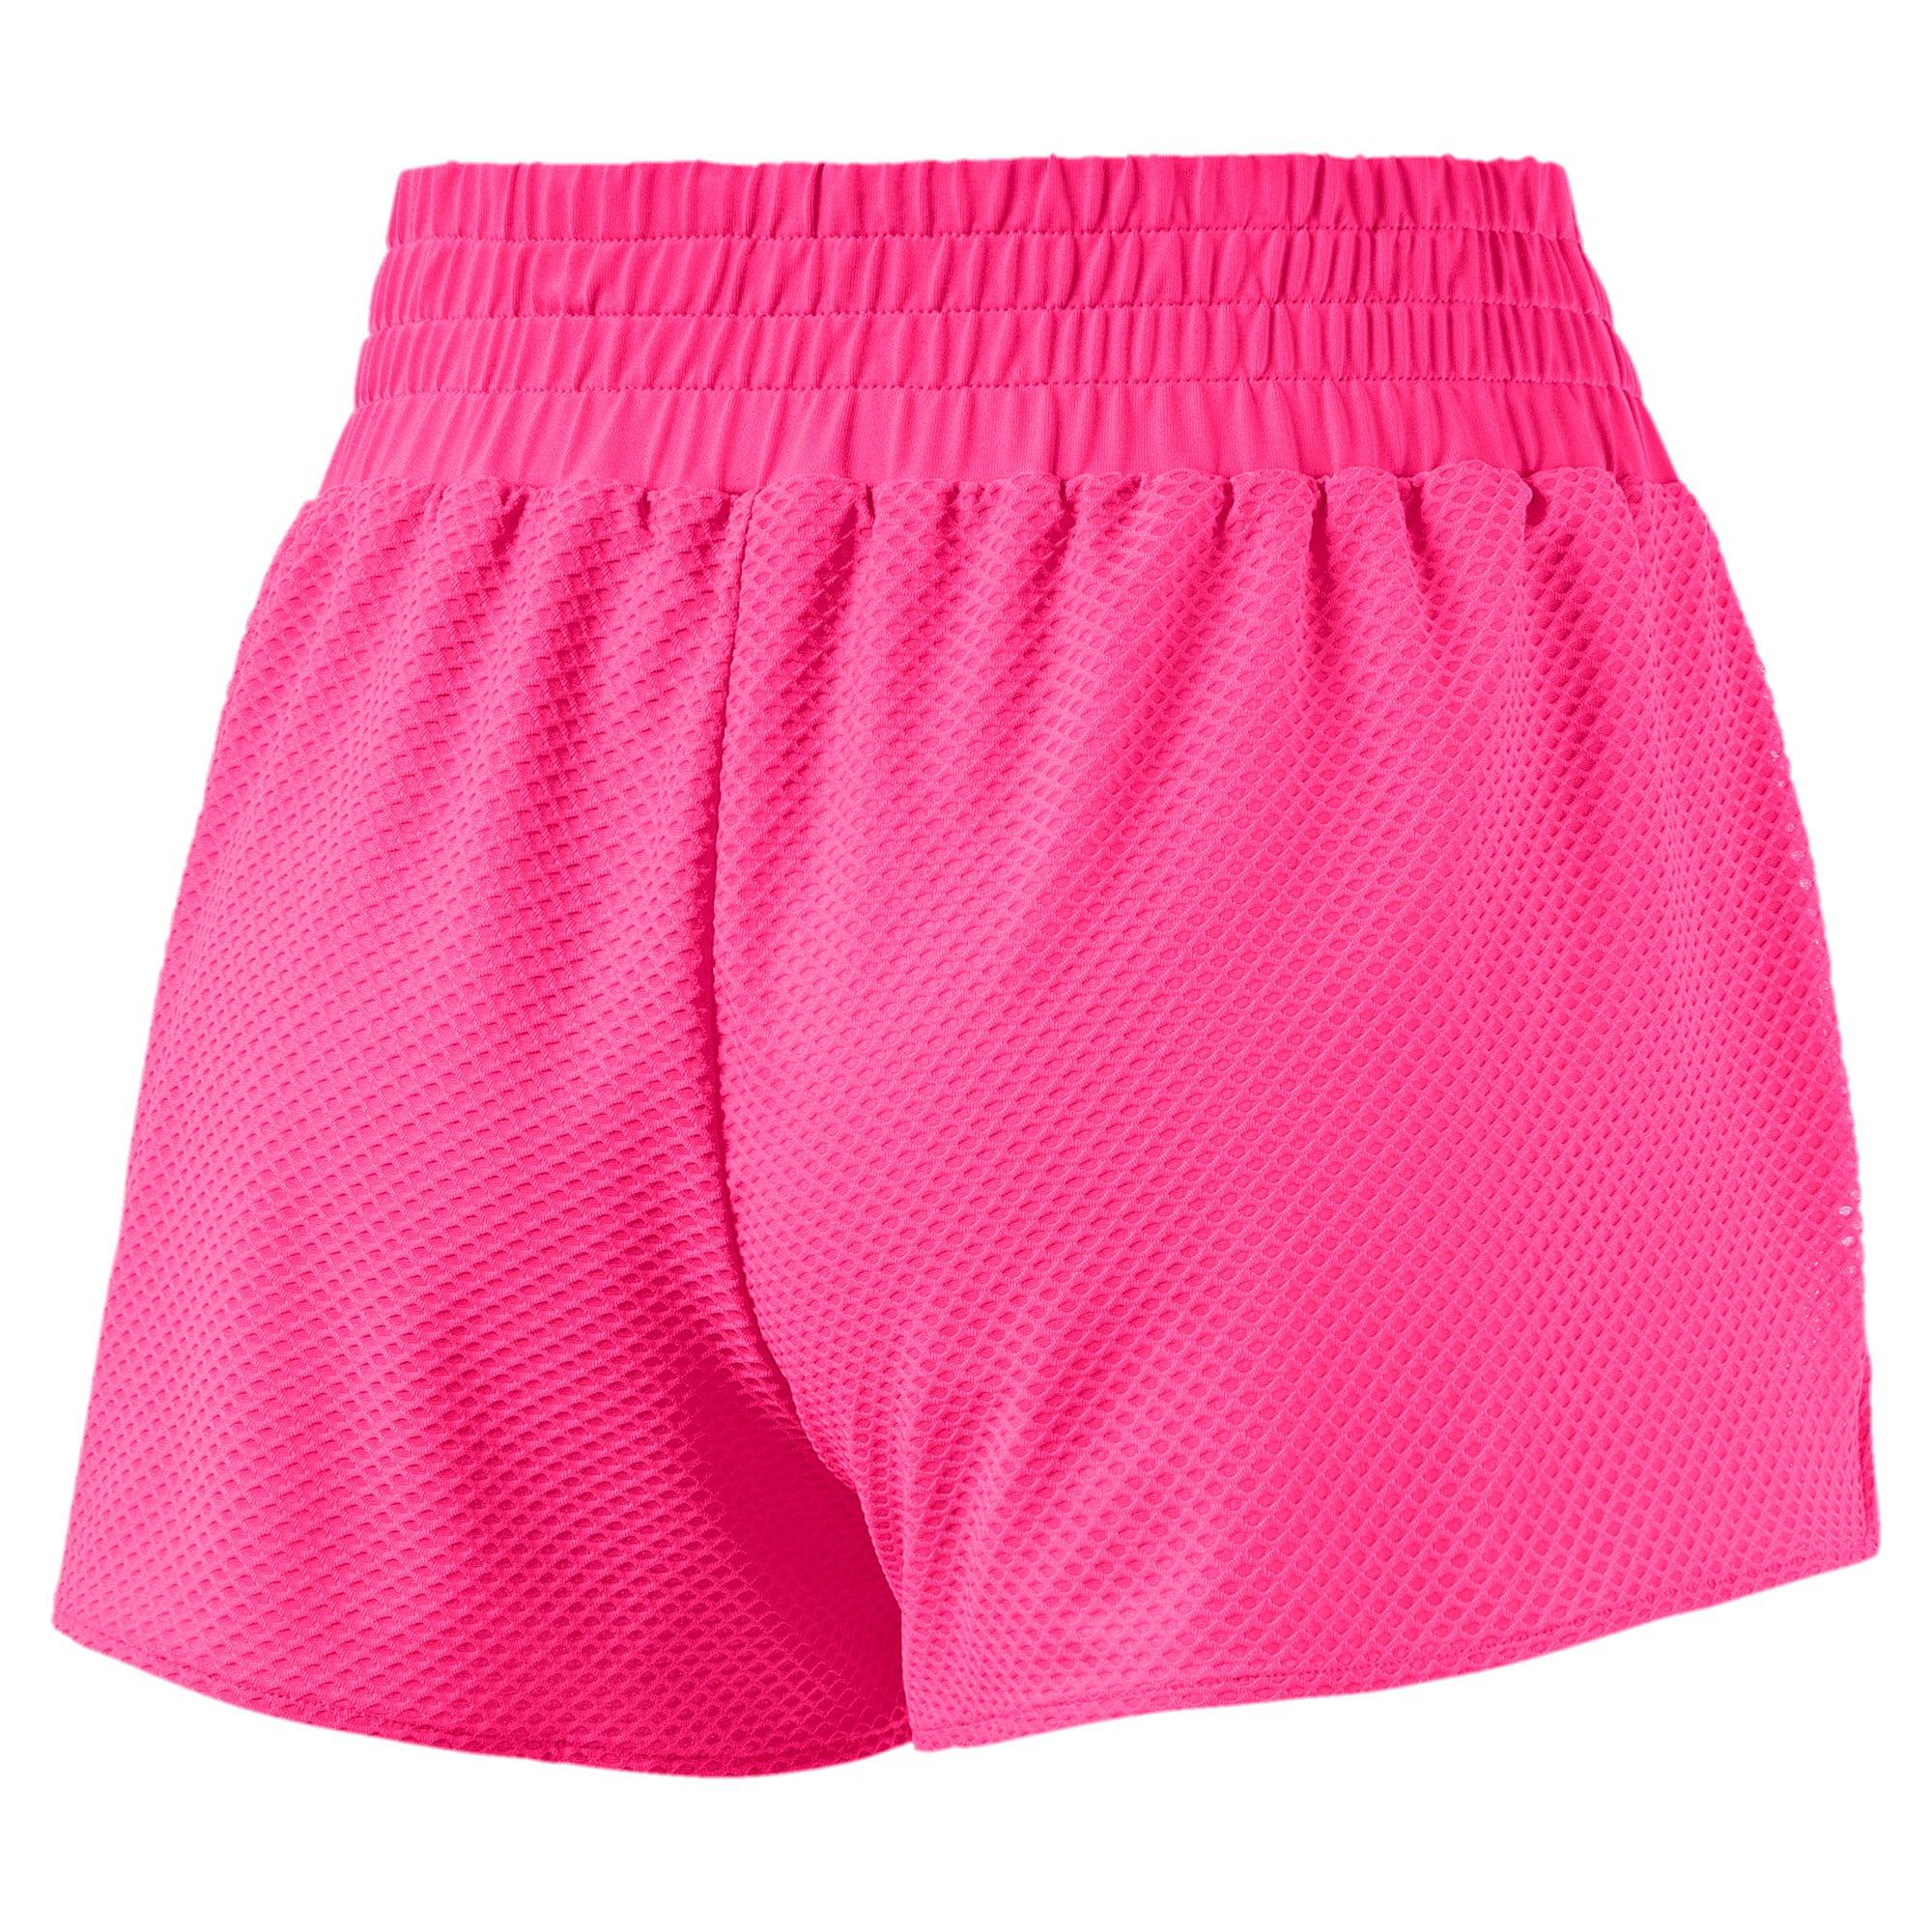 Thumbnail 4 of Active Training Women's Mesh Shorts, KNOCKOUT PINK, medium-IND